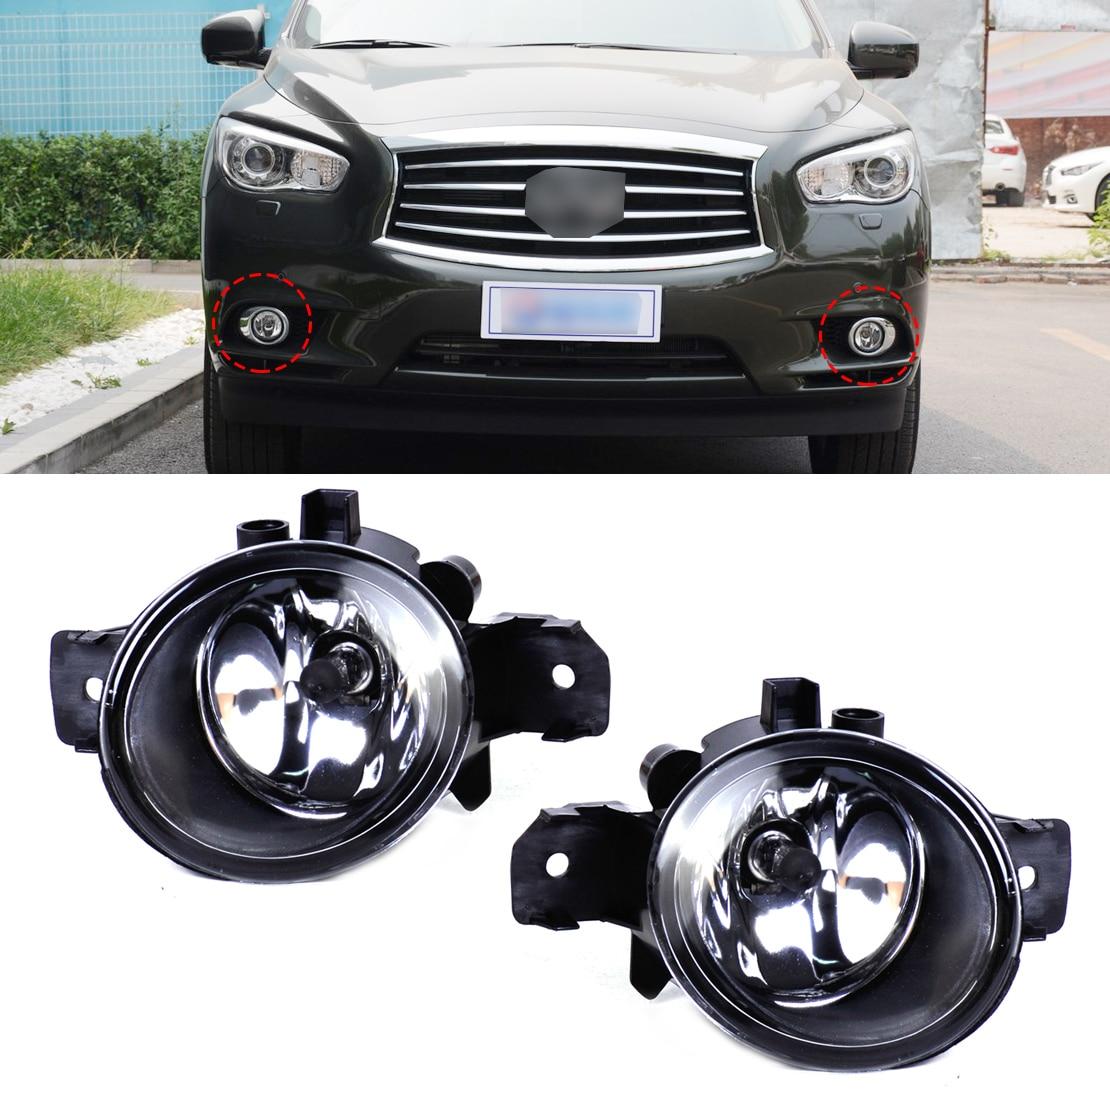 ФОТО Pair Drive Passenger Fog Light Lamp + H11 Halogen Bulb Len Fit for Nissan Altima Maxima Versa Infiniti 26155-89927 26150-8992